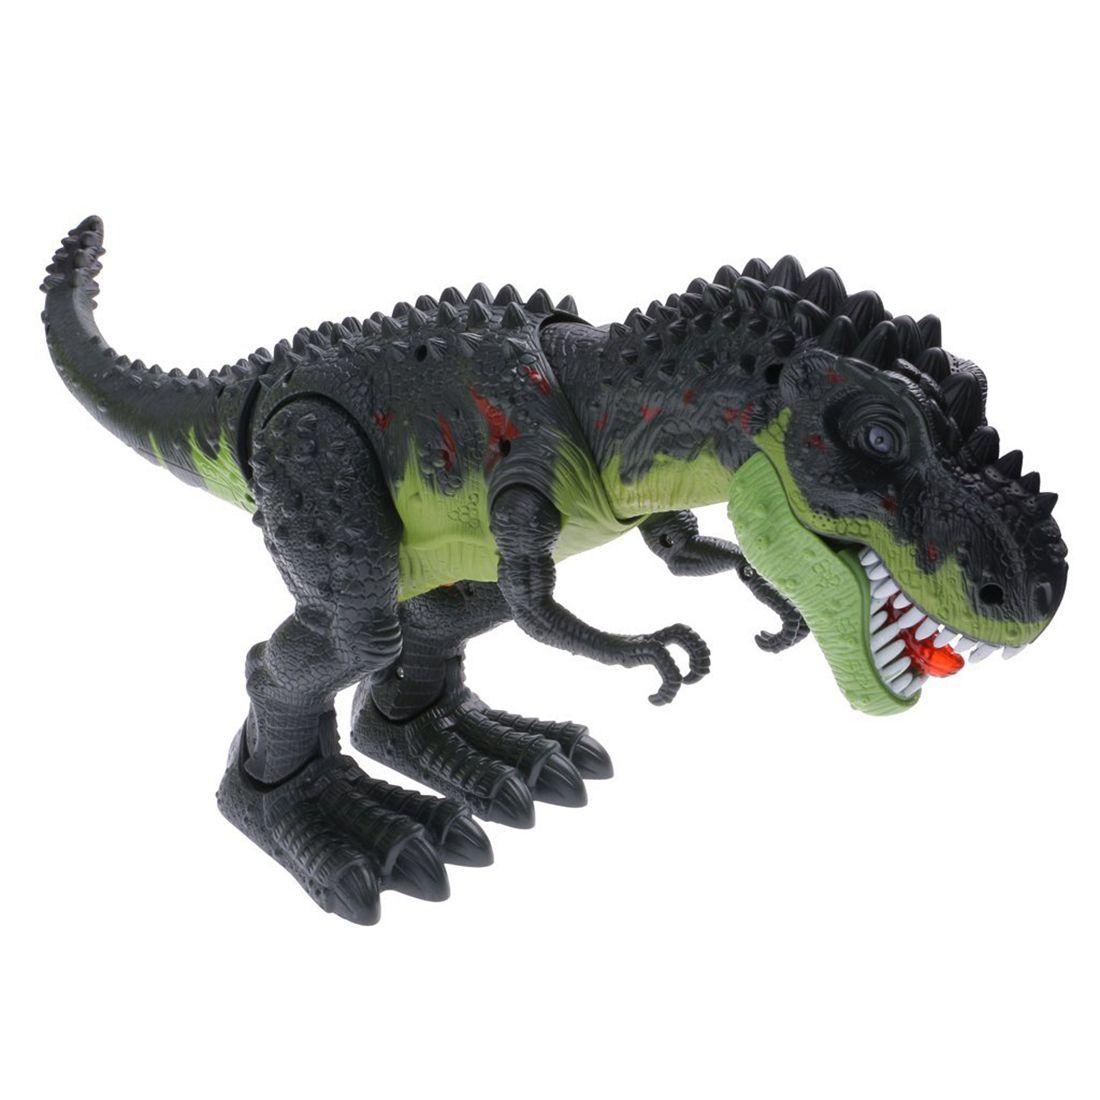 Cool Electric Walking Dinosaur Robot Toy Sound Light Moving Kids Gift